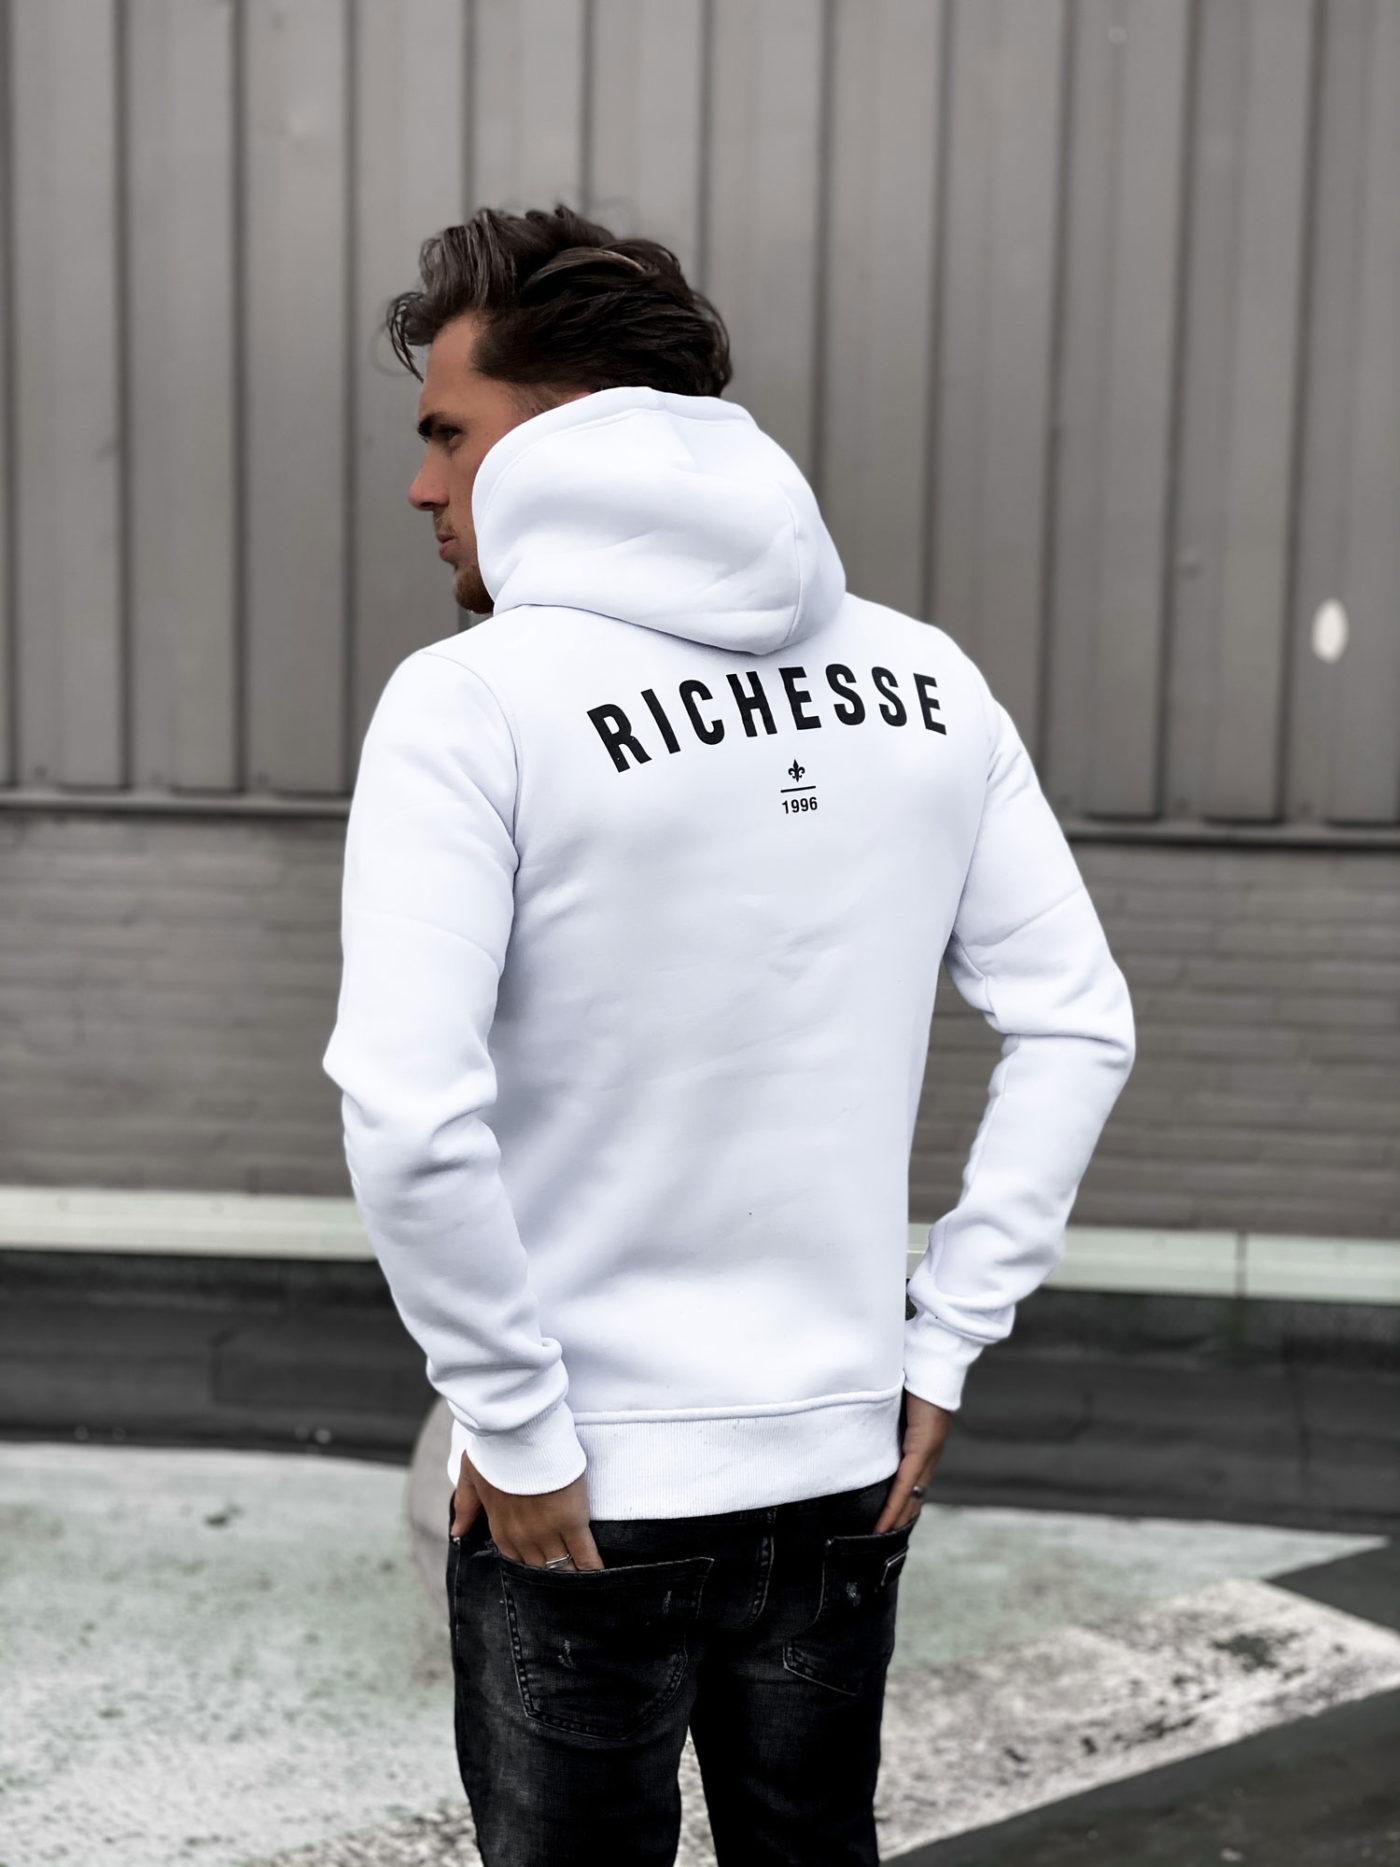 Richesse-Brand-Back-White-cover-1